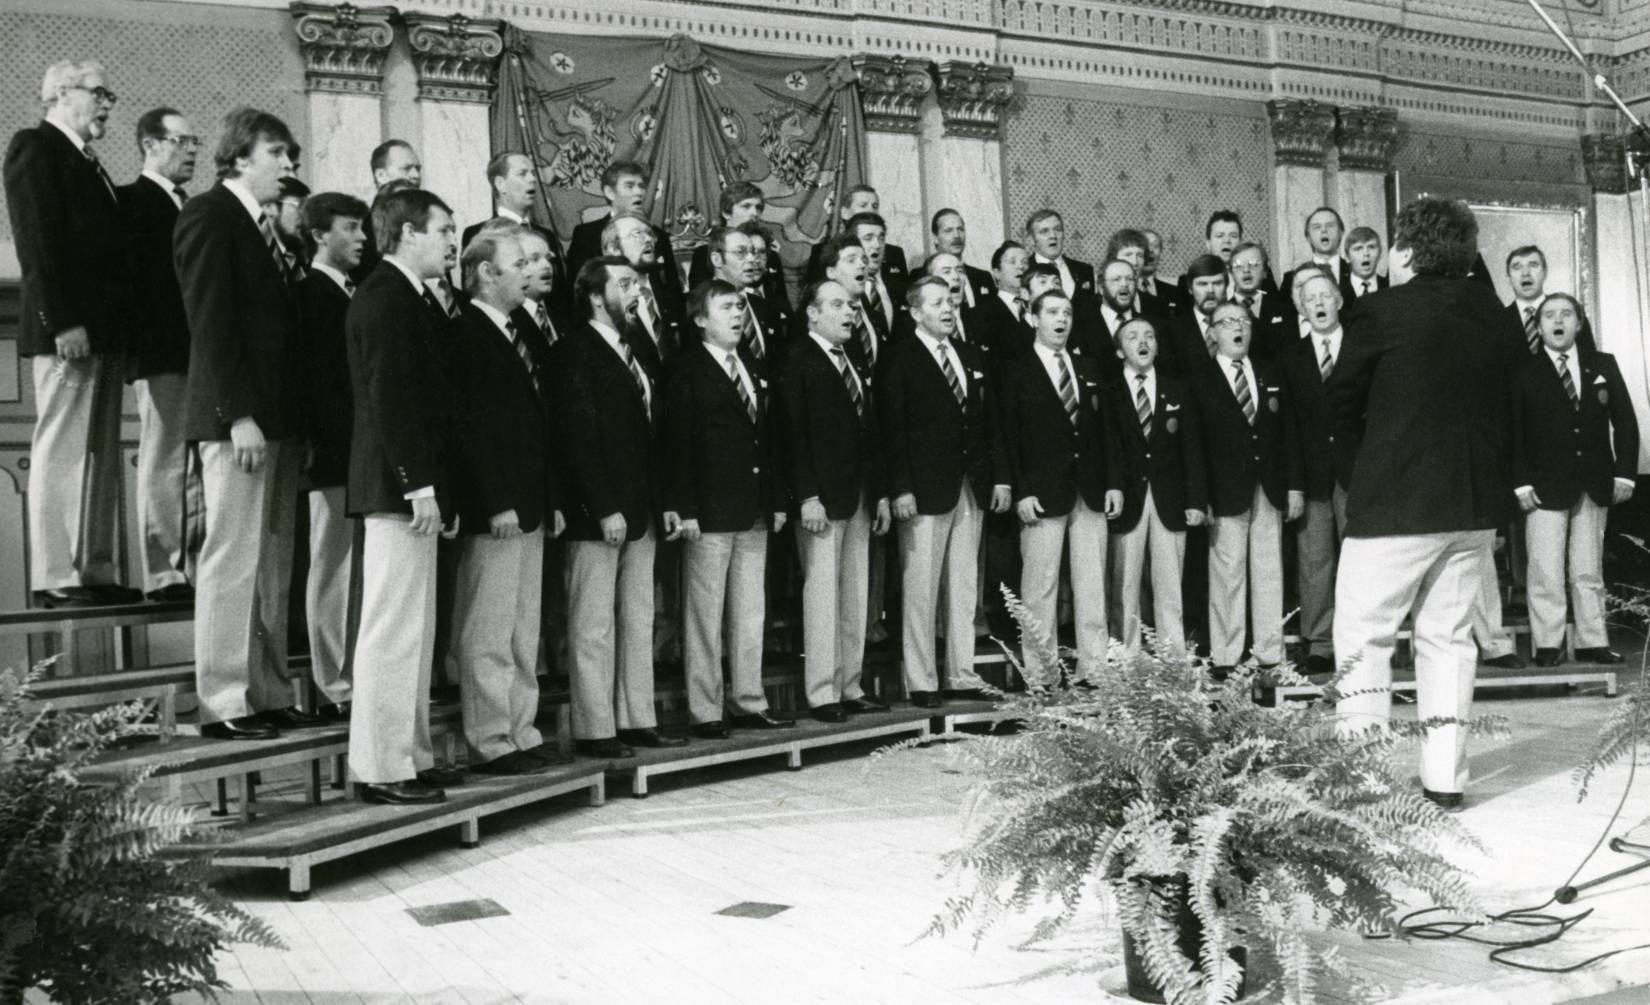 Laulu-Jaakkojen konsertti maaherran juhlissa